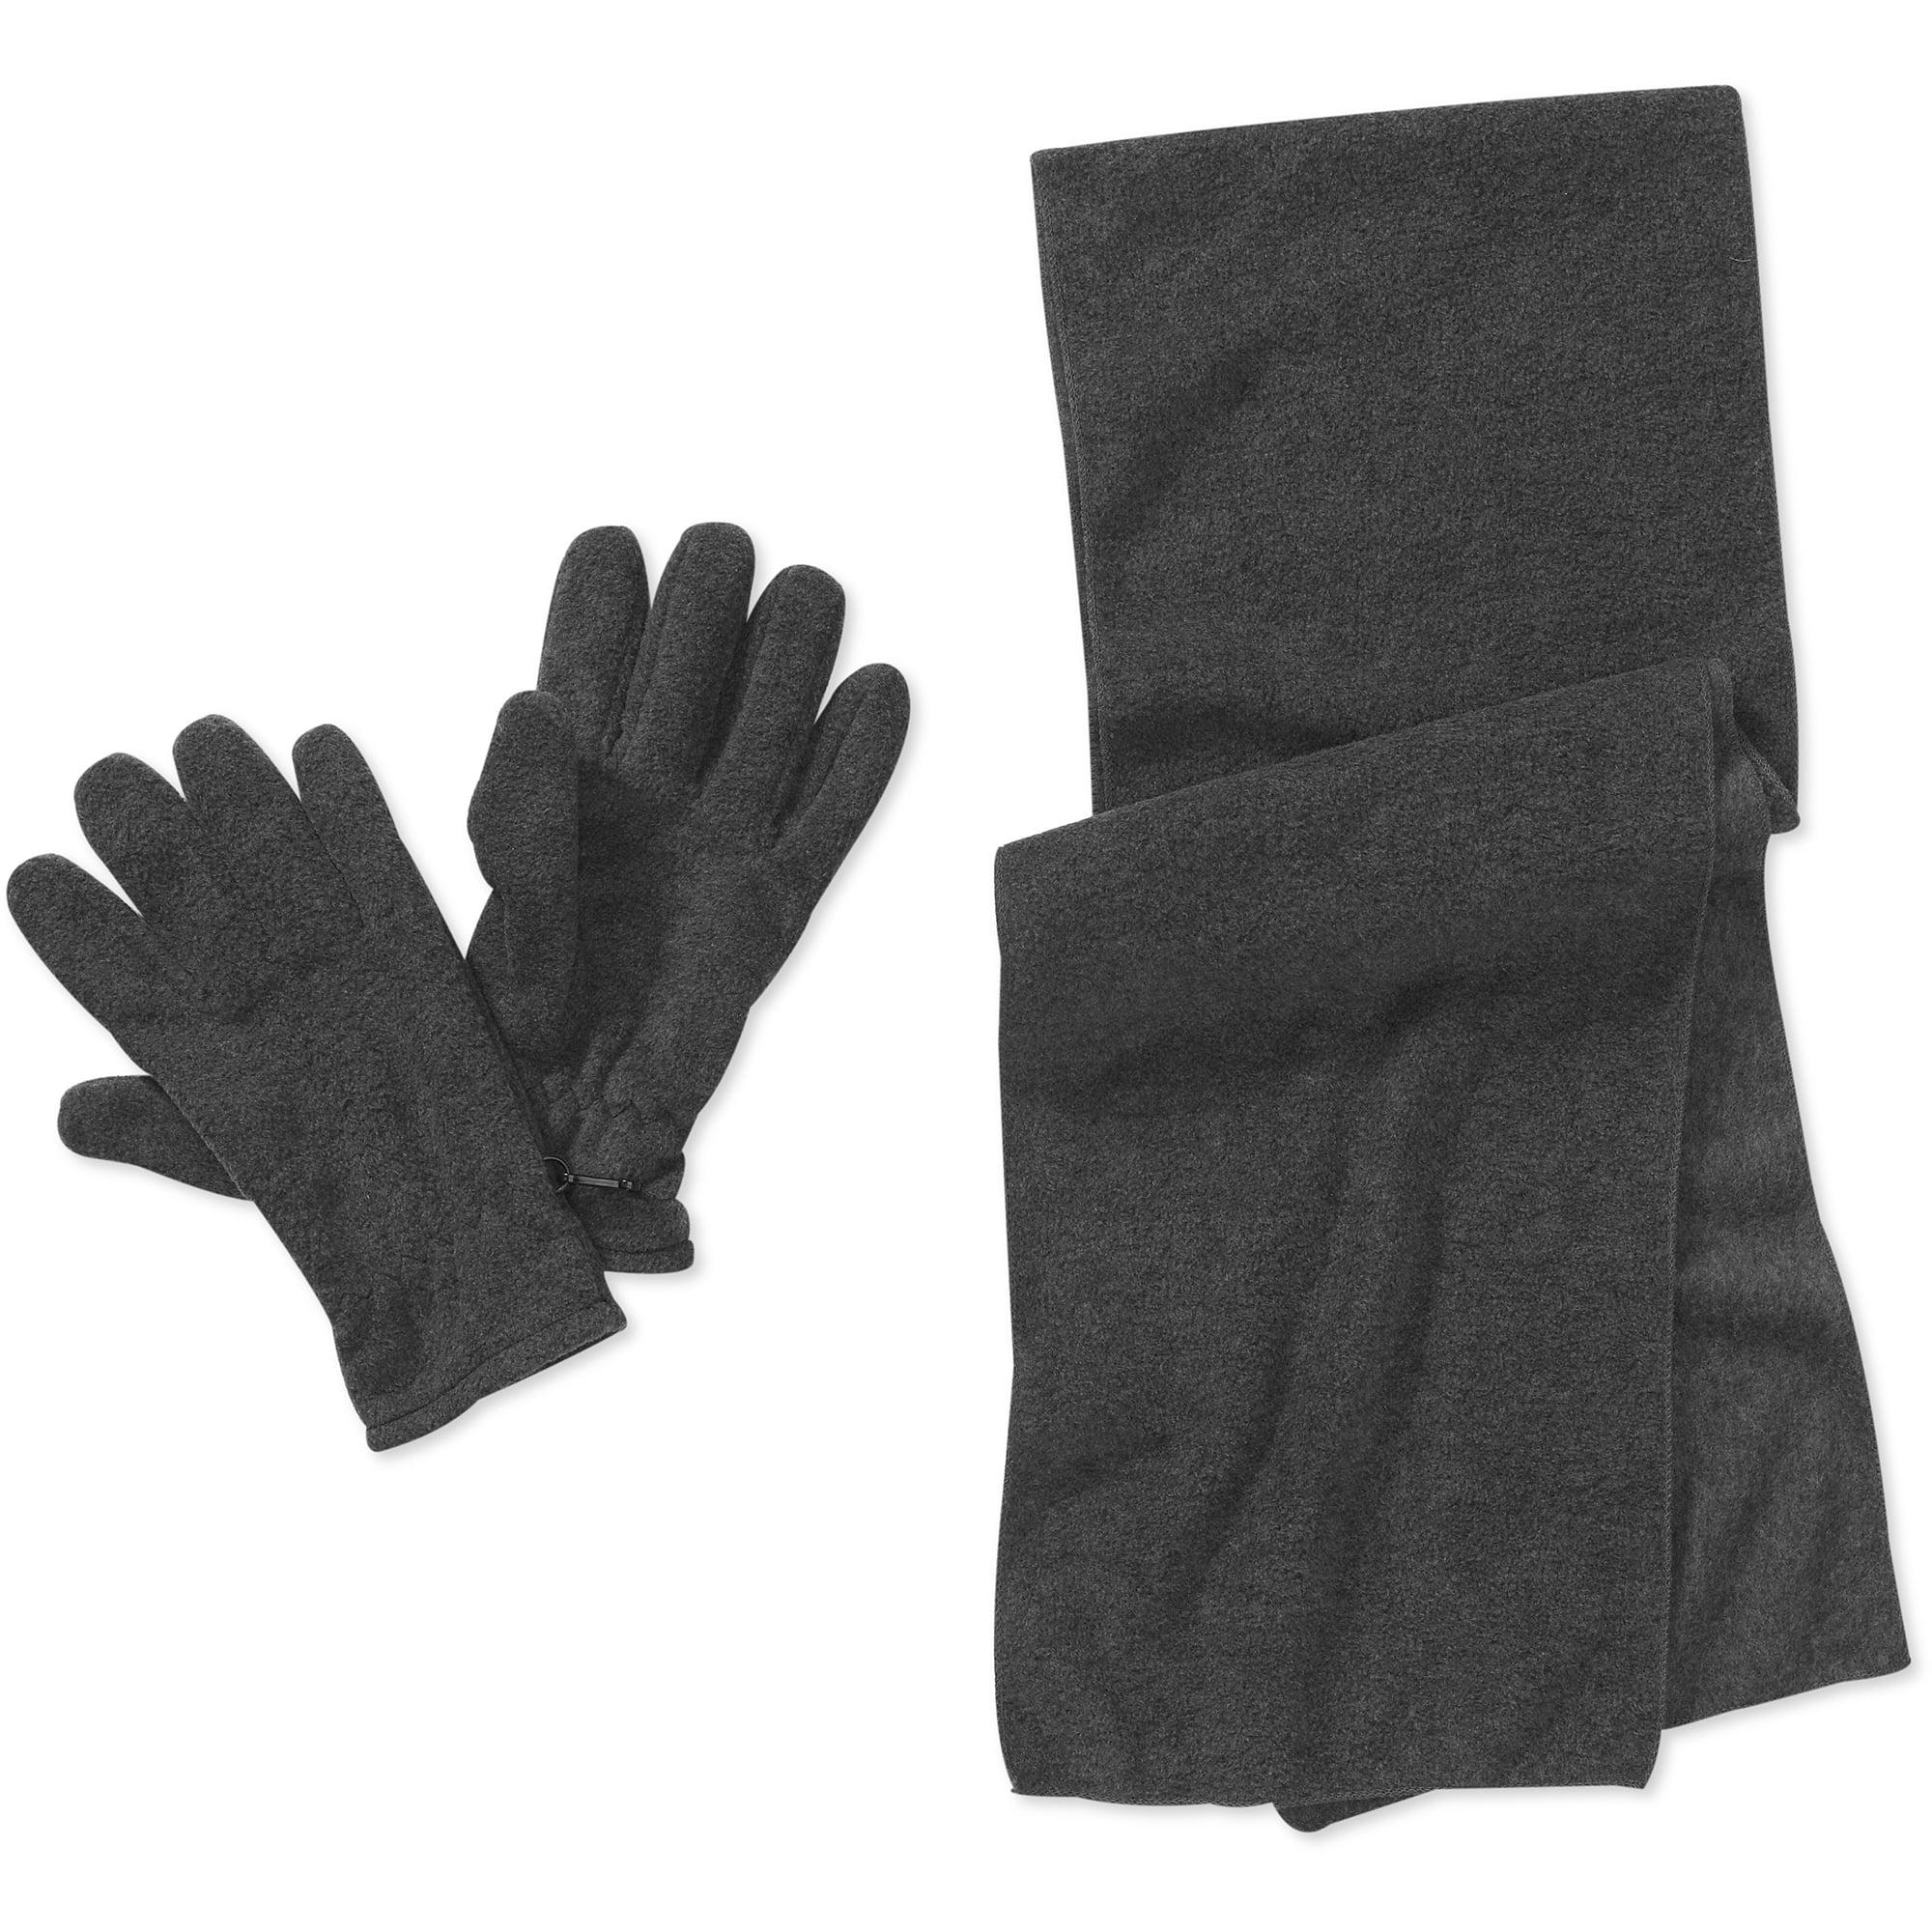 Men's Fleece Scarf and Gloves Set